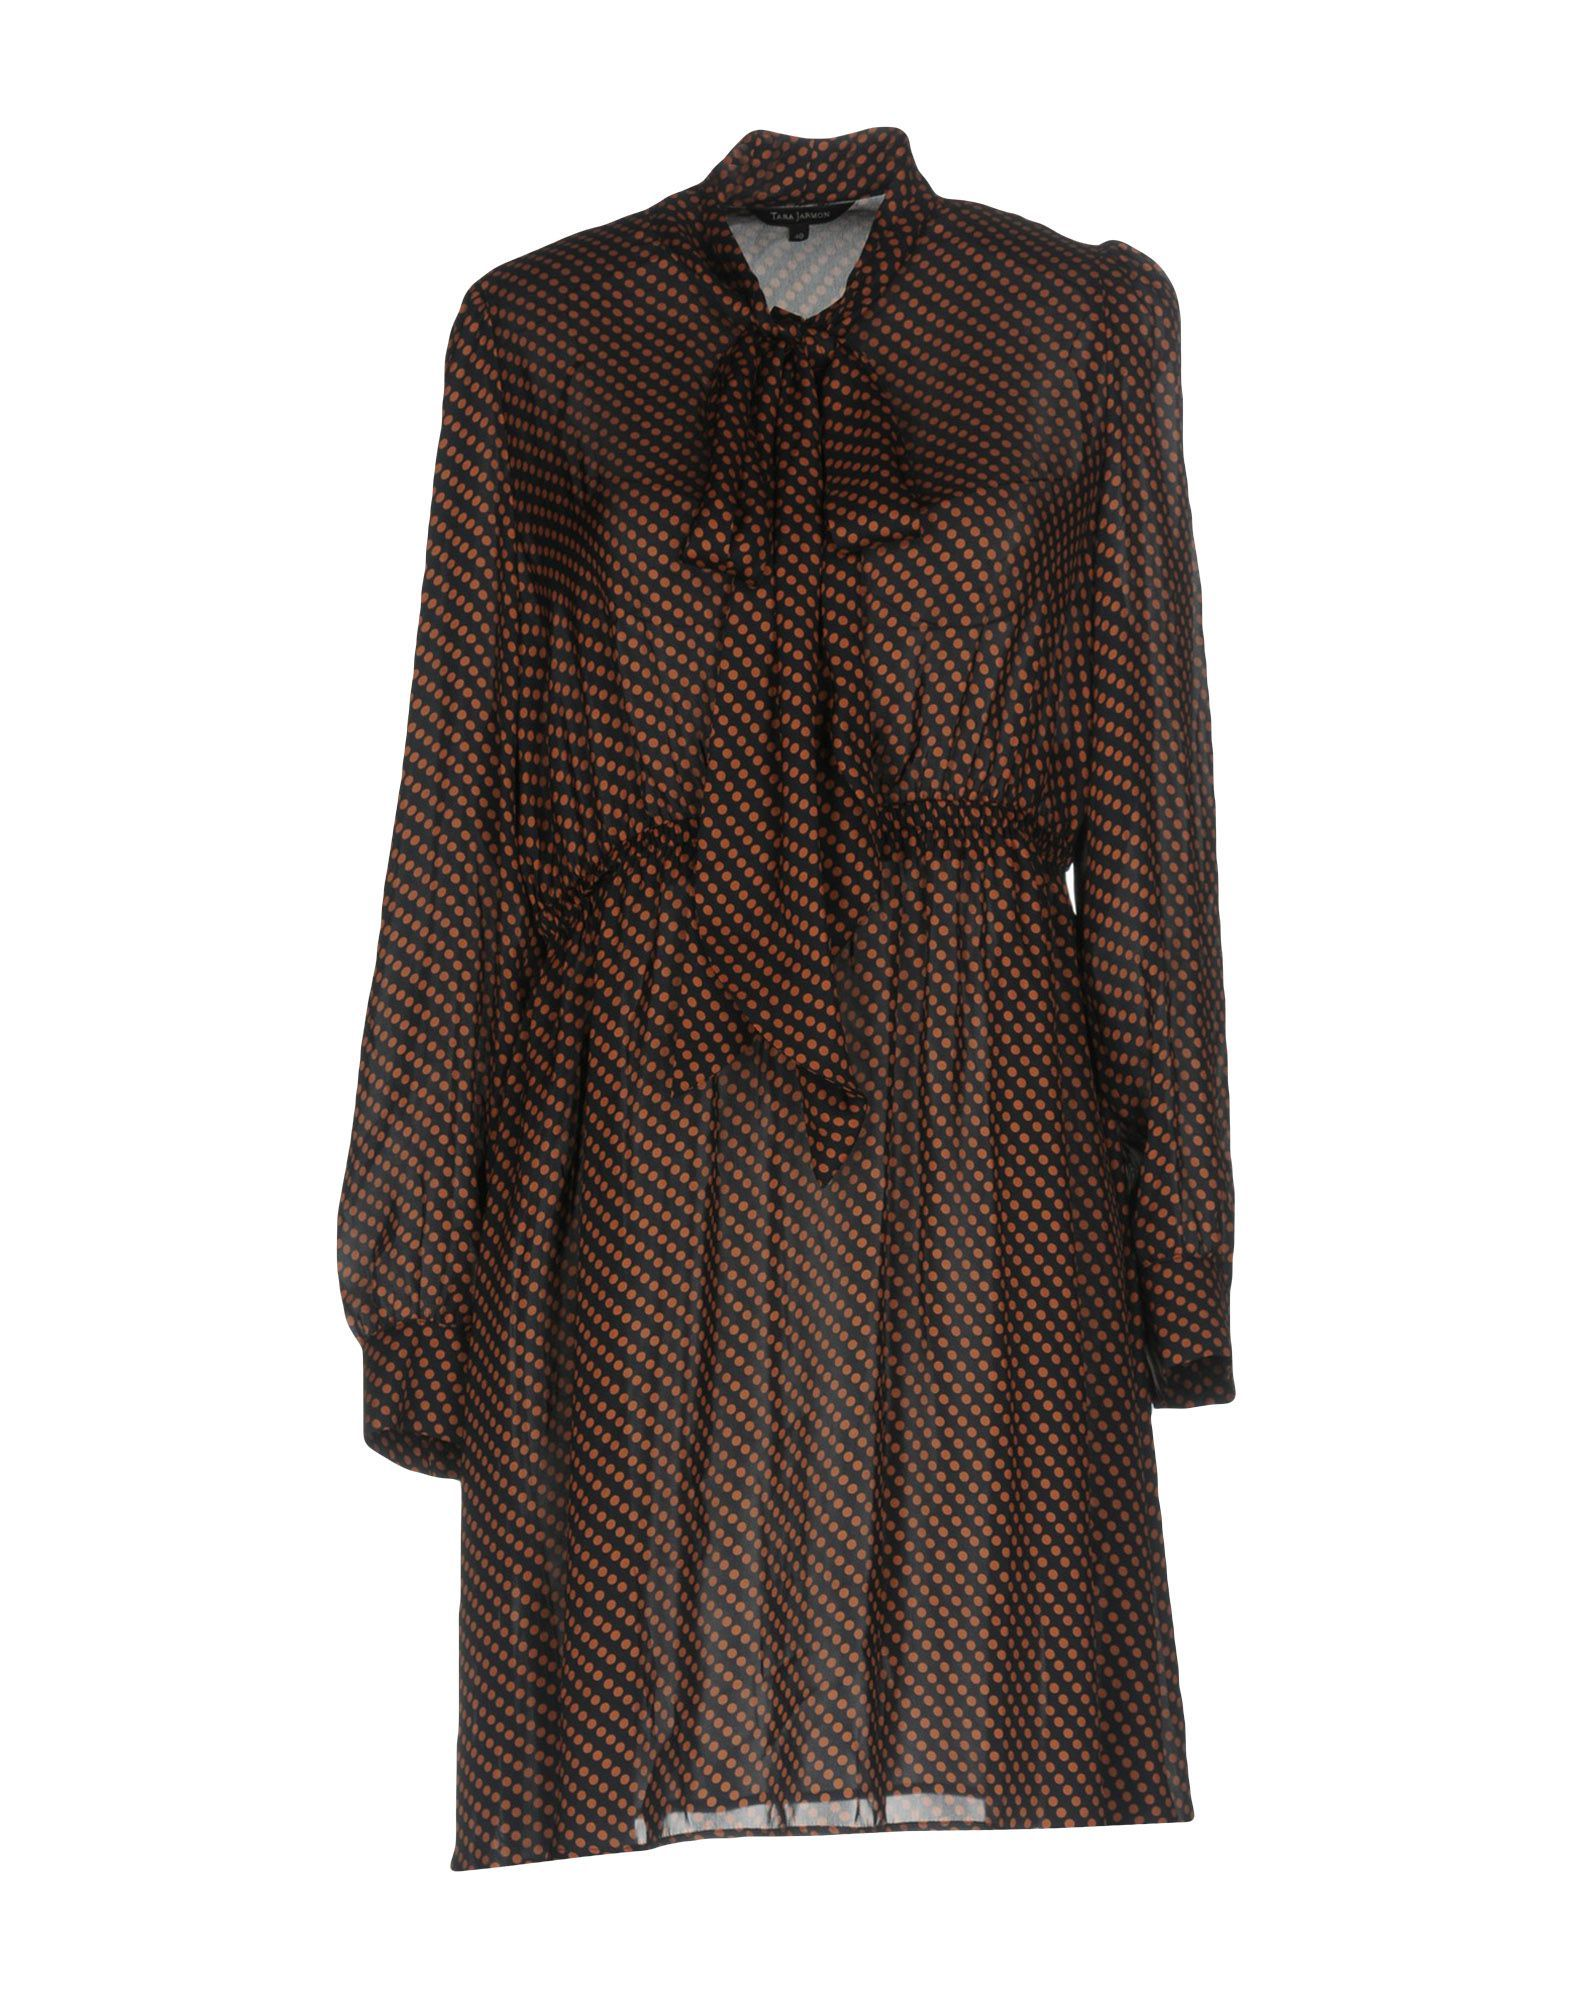 Tara Jarmon Polka Dot Satin Long Sleeve Dress